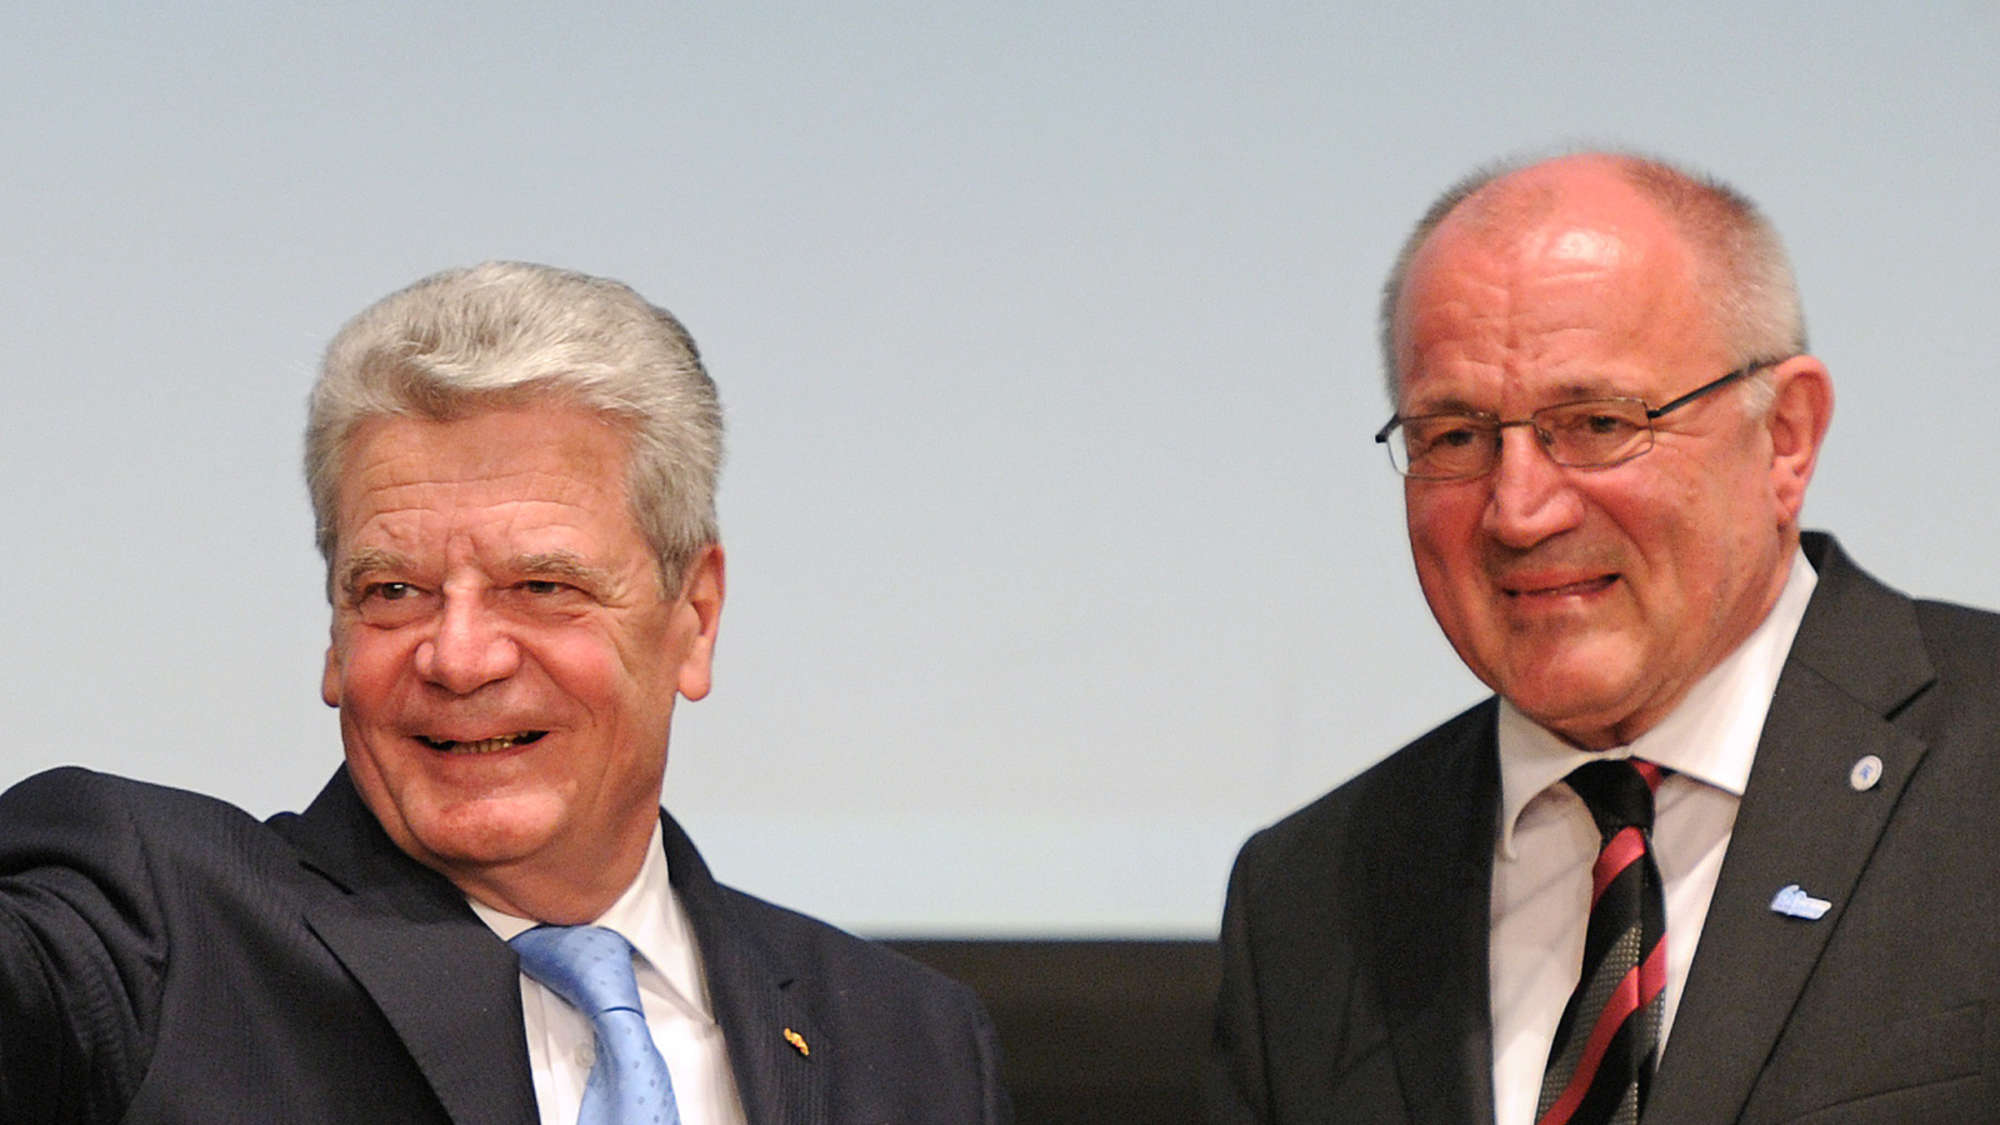 Kinderschutzbund: Gauck soll Asylpaket II stoppen | Politik